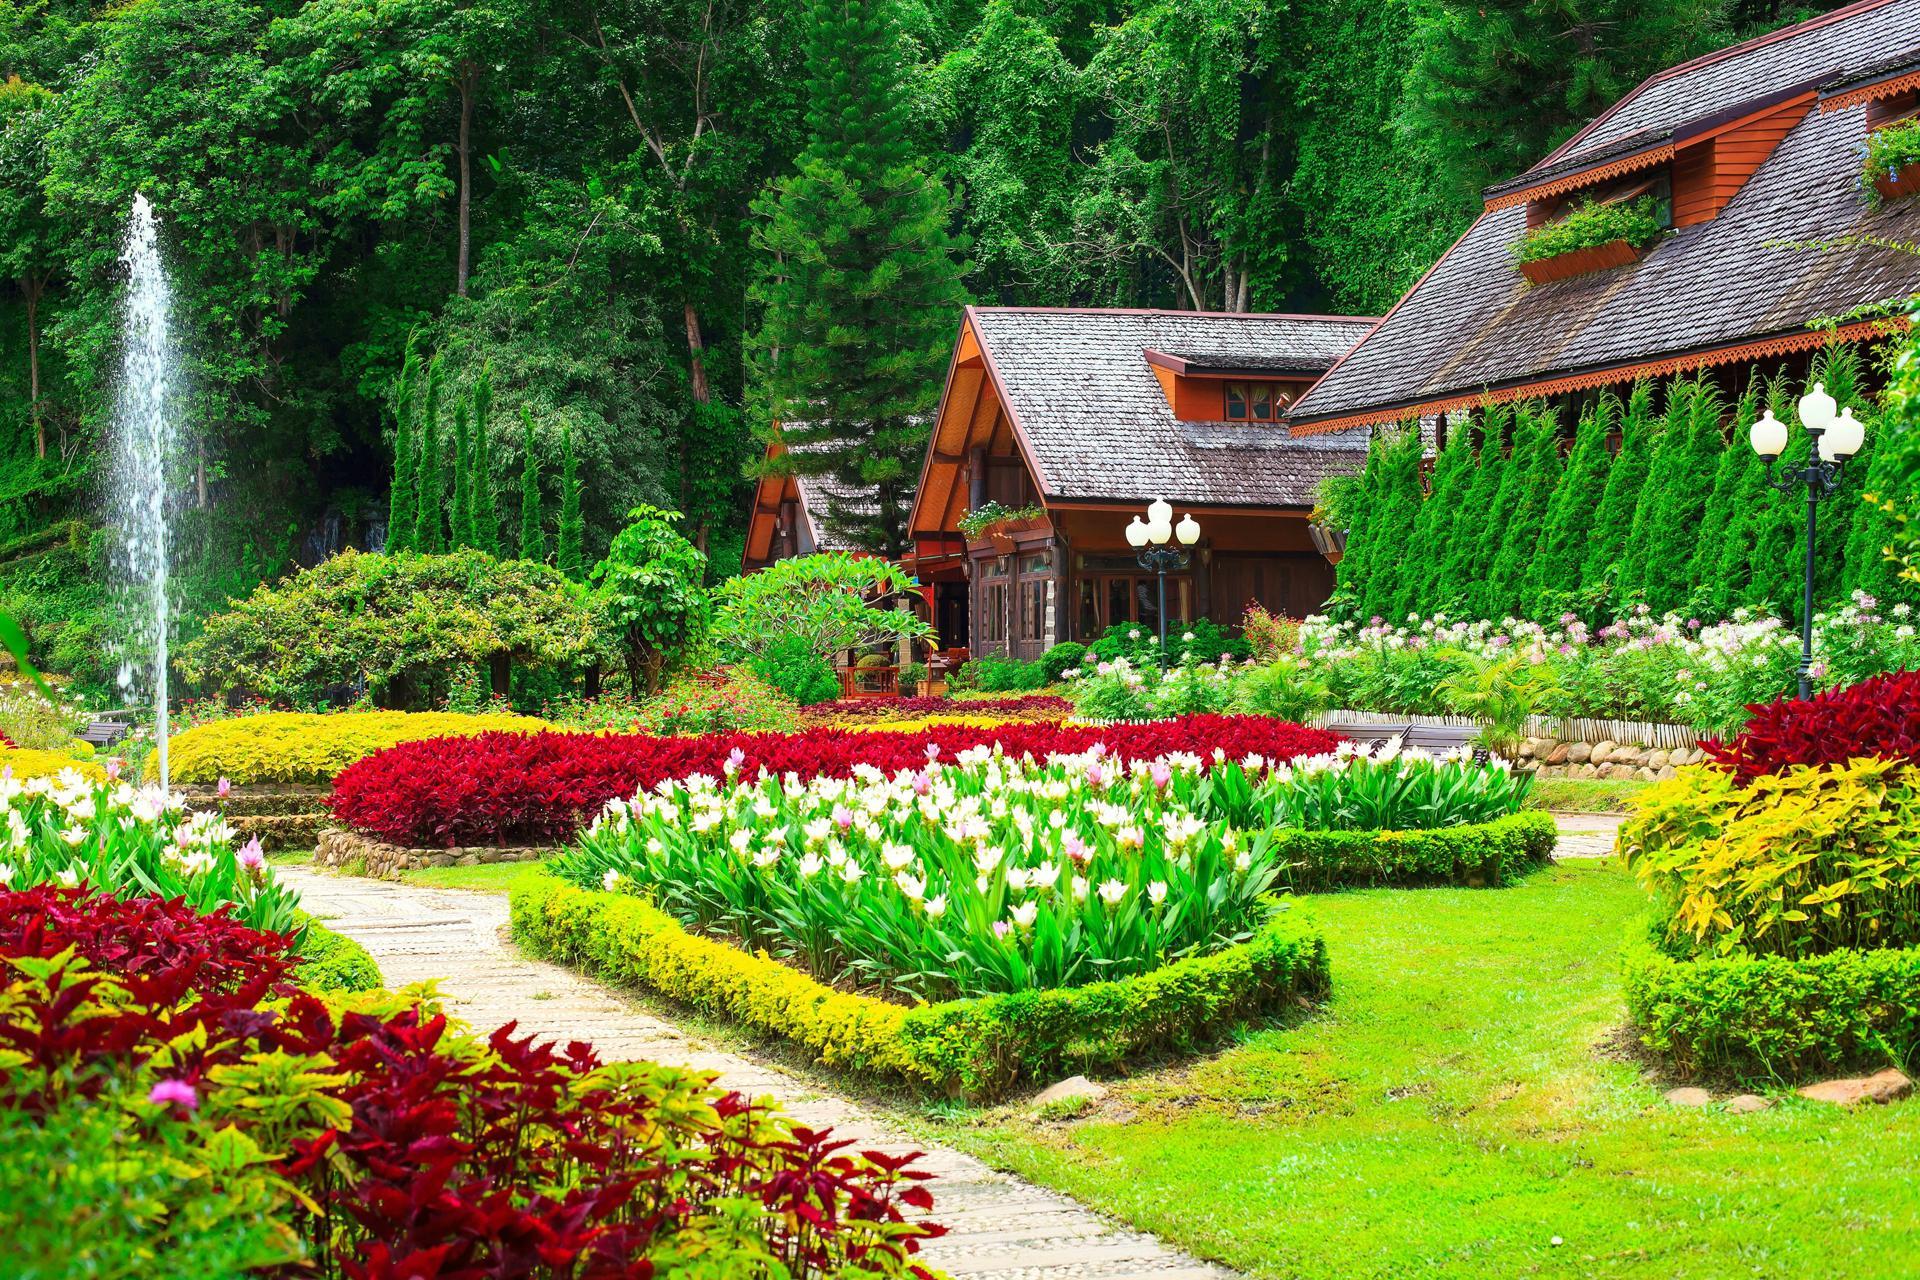 Home Garden Hd 810241 Hd Wallpaper Backgrounds Download